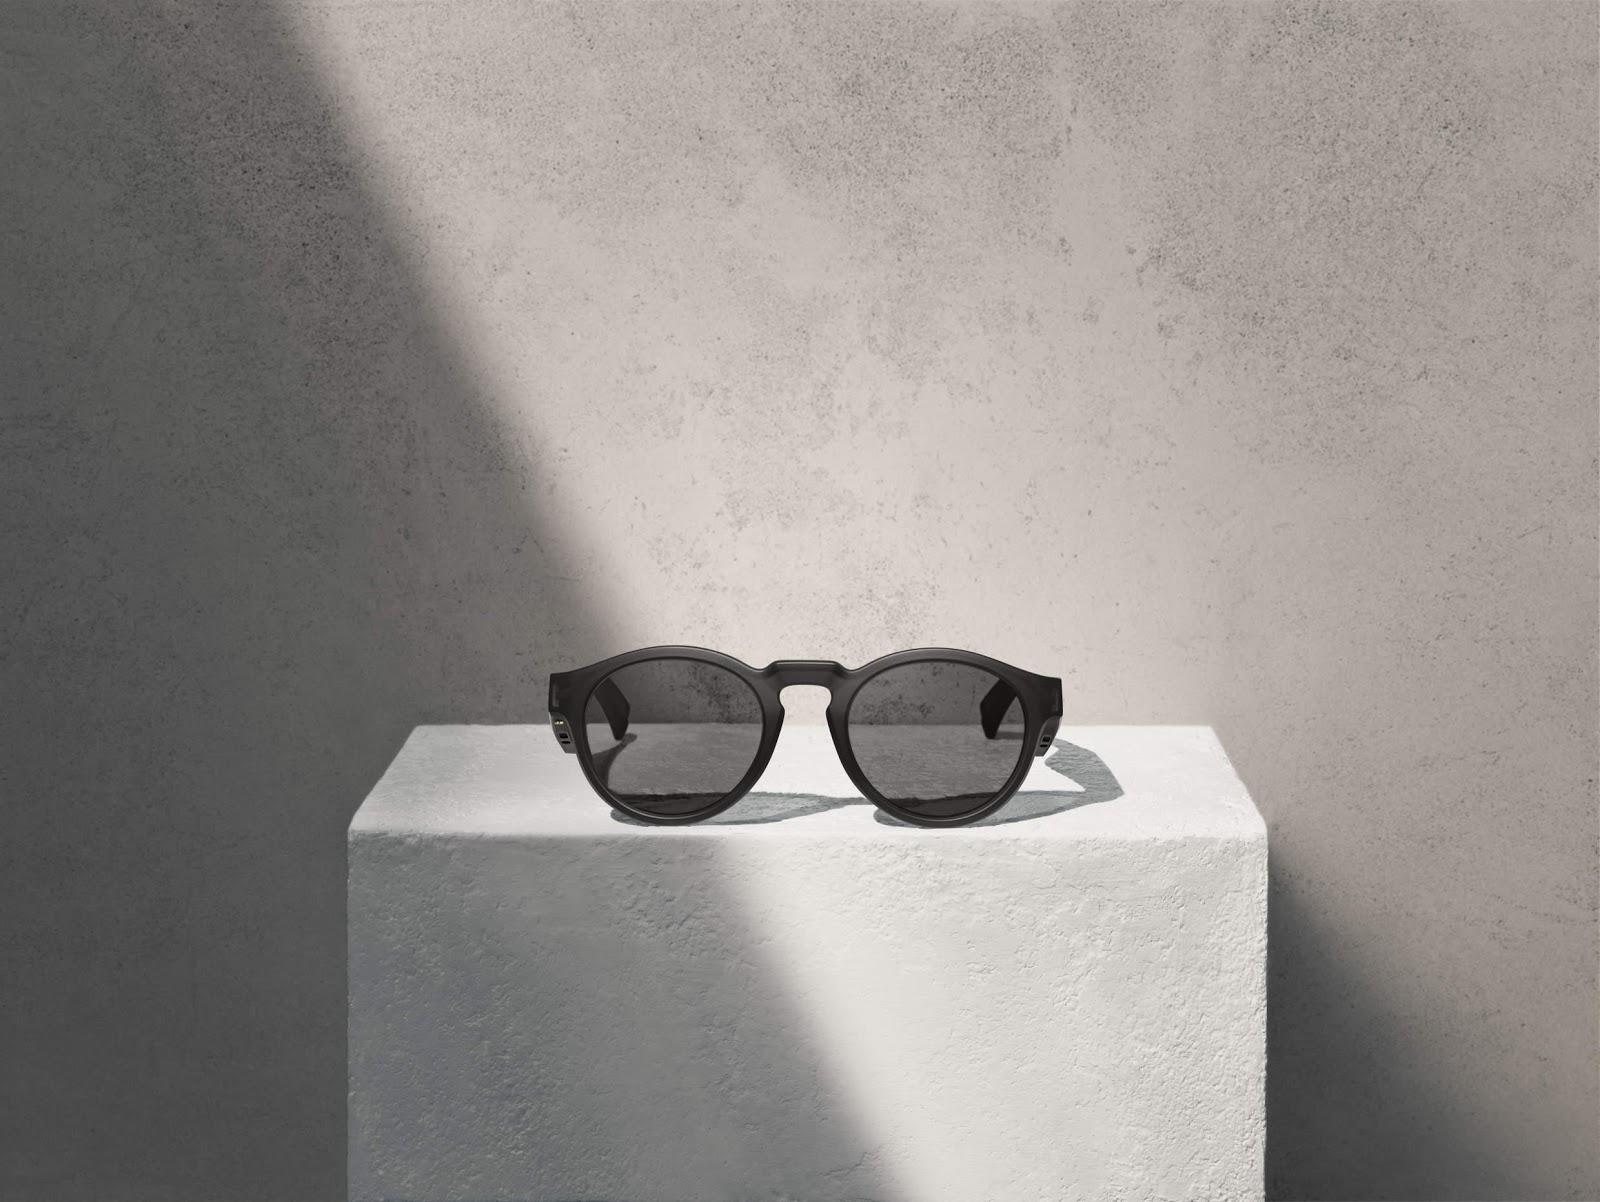 Bose Frames at InMotion